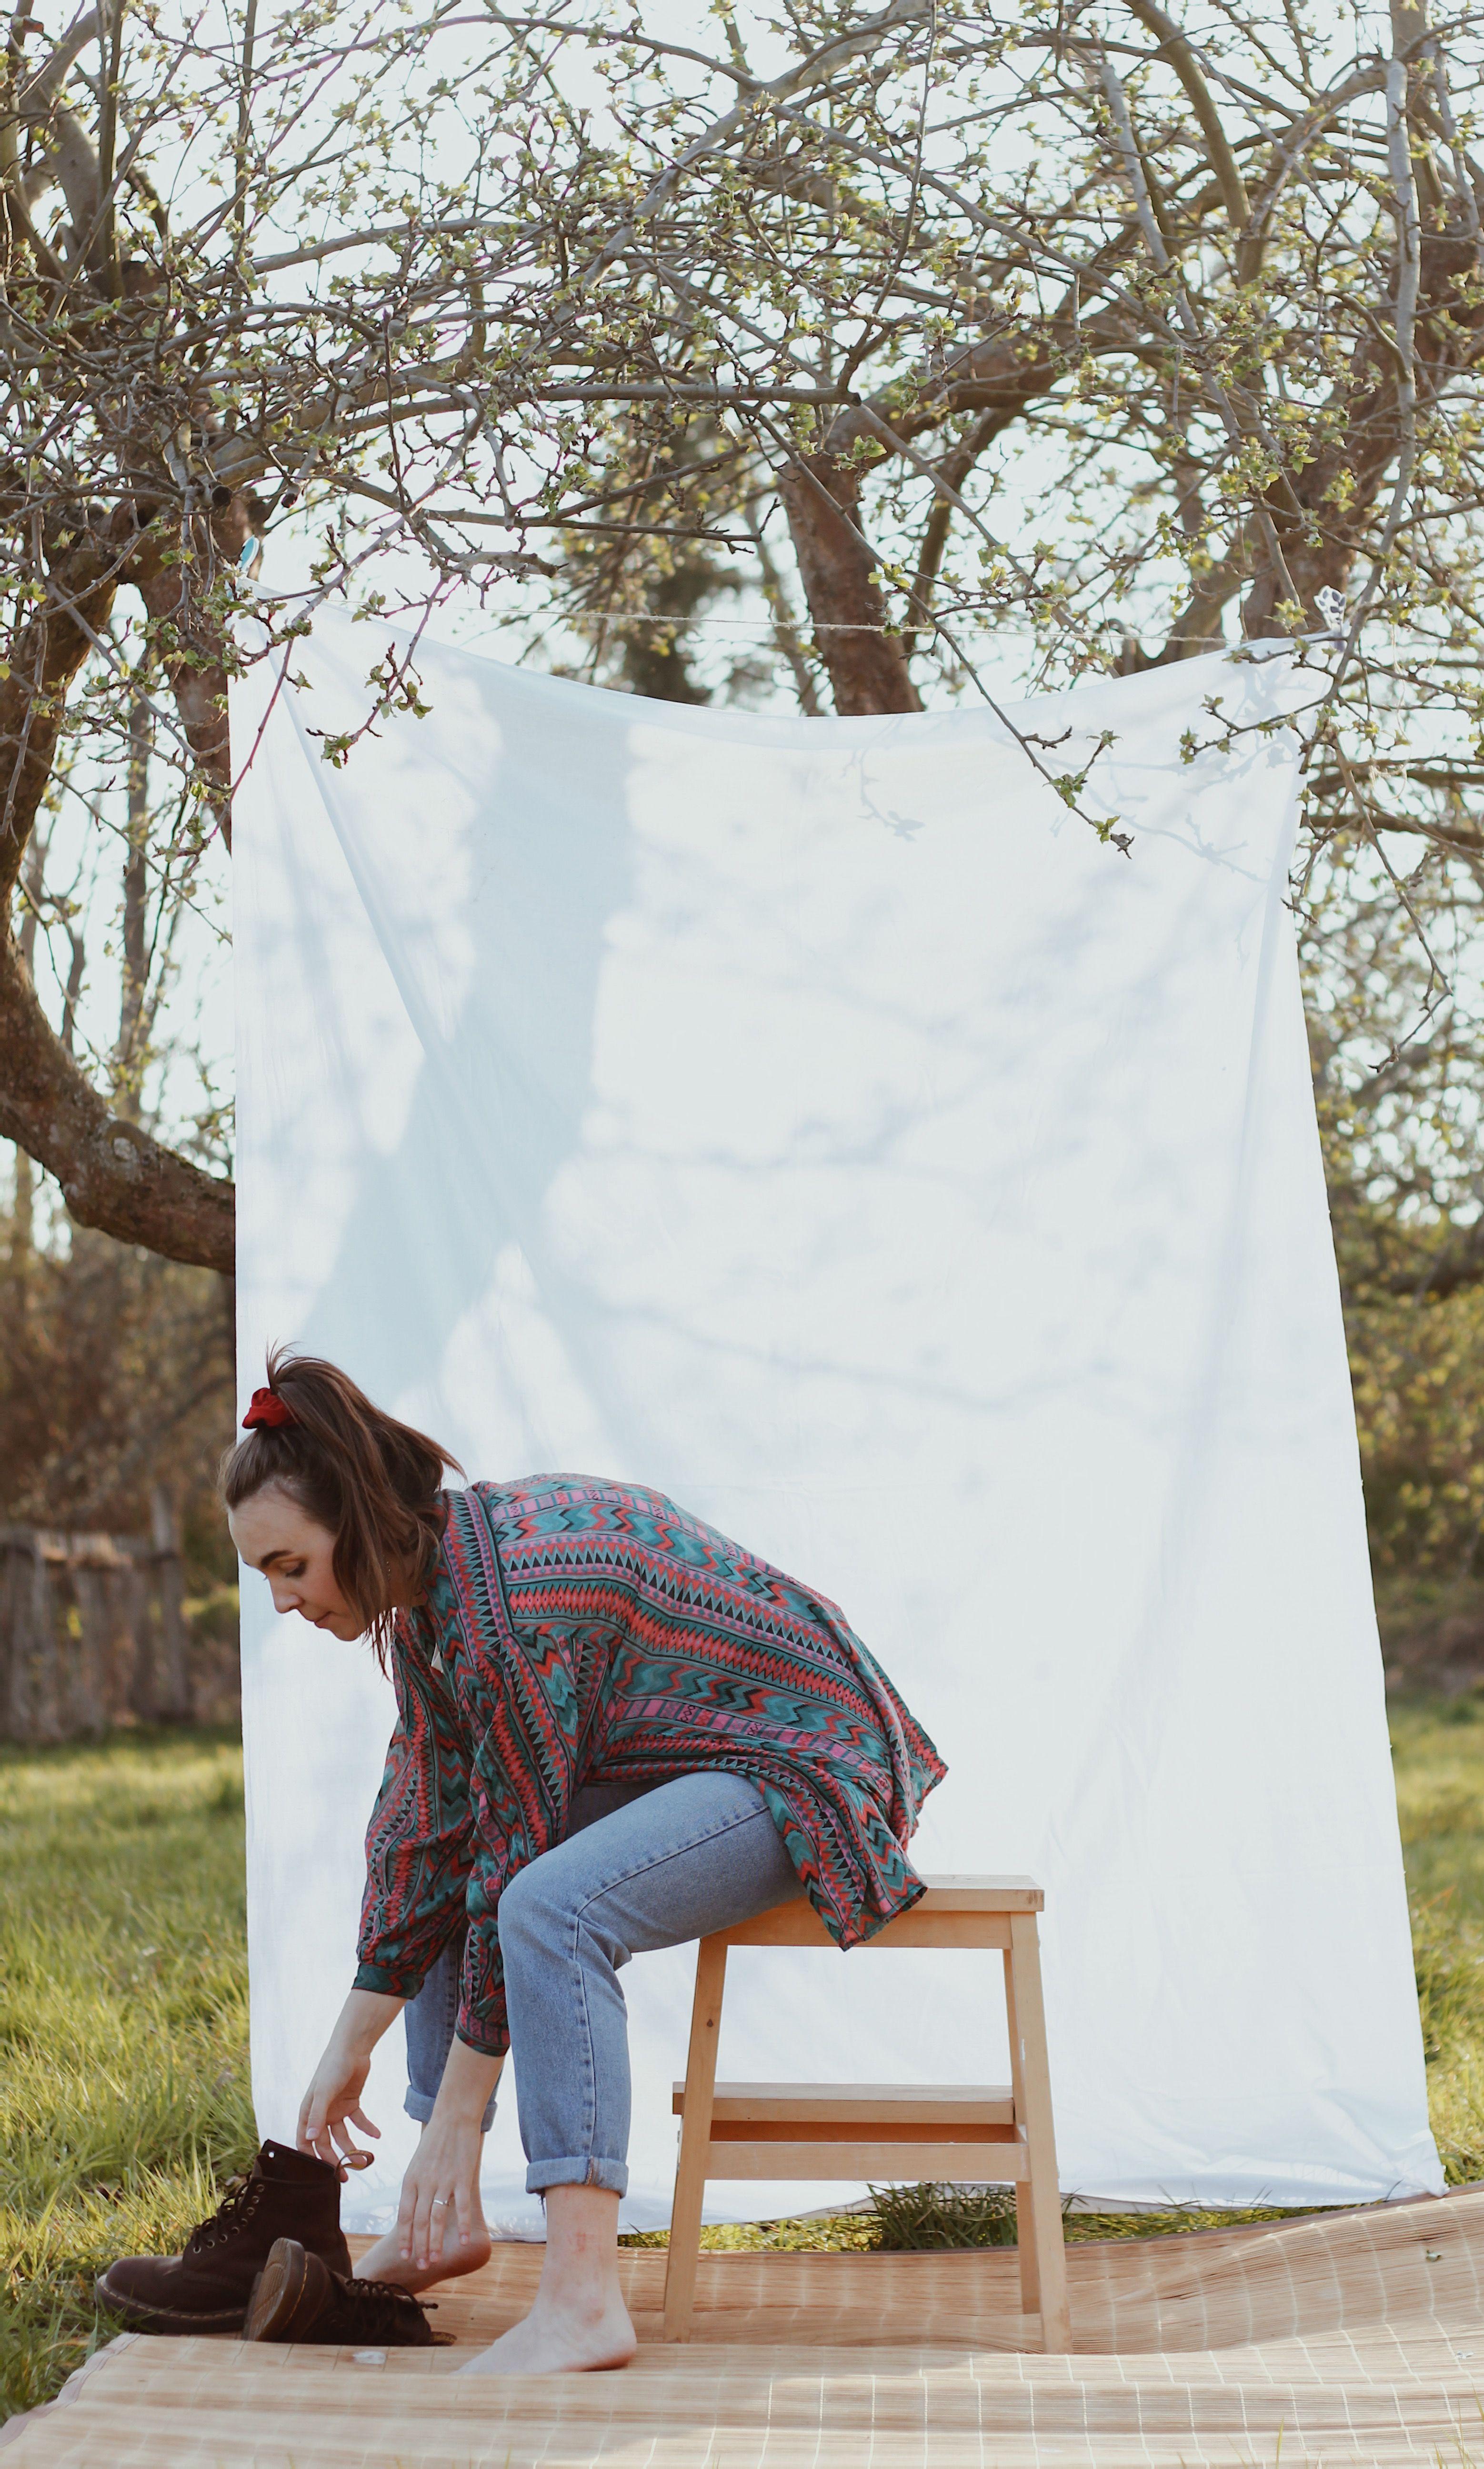 #photography #photooftheday #female #apple #docmartens #fashion #sunlight #garden